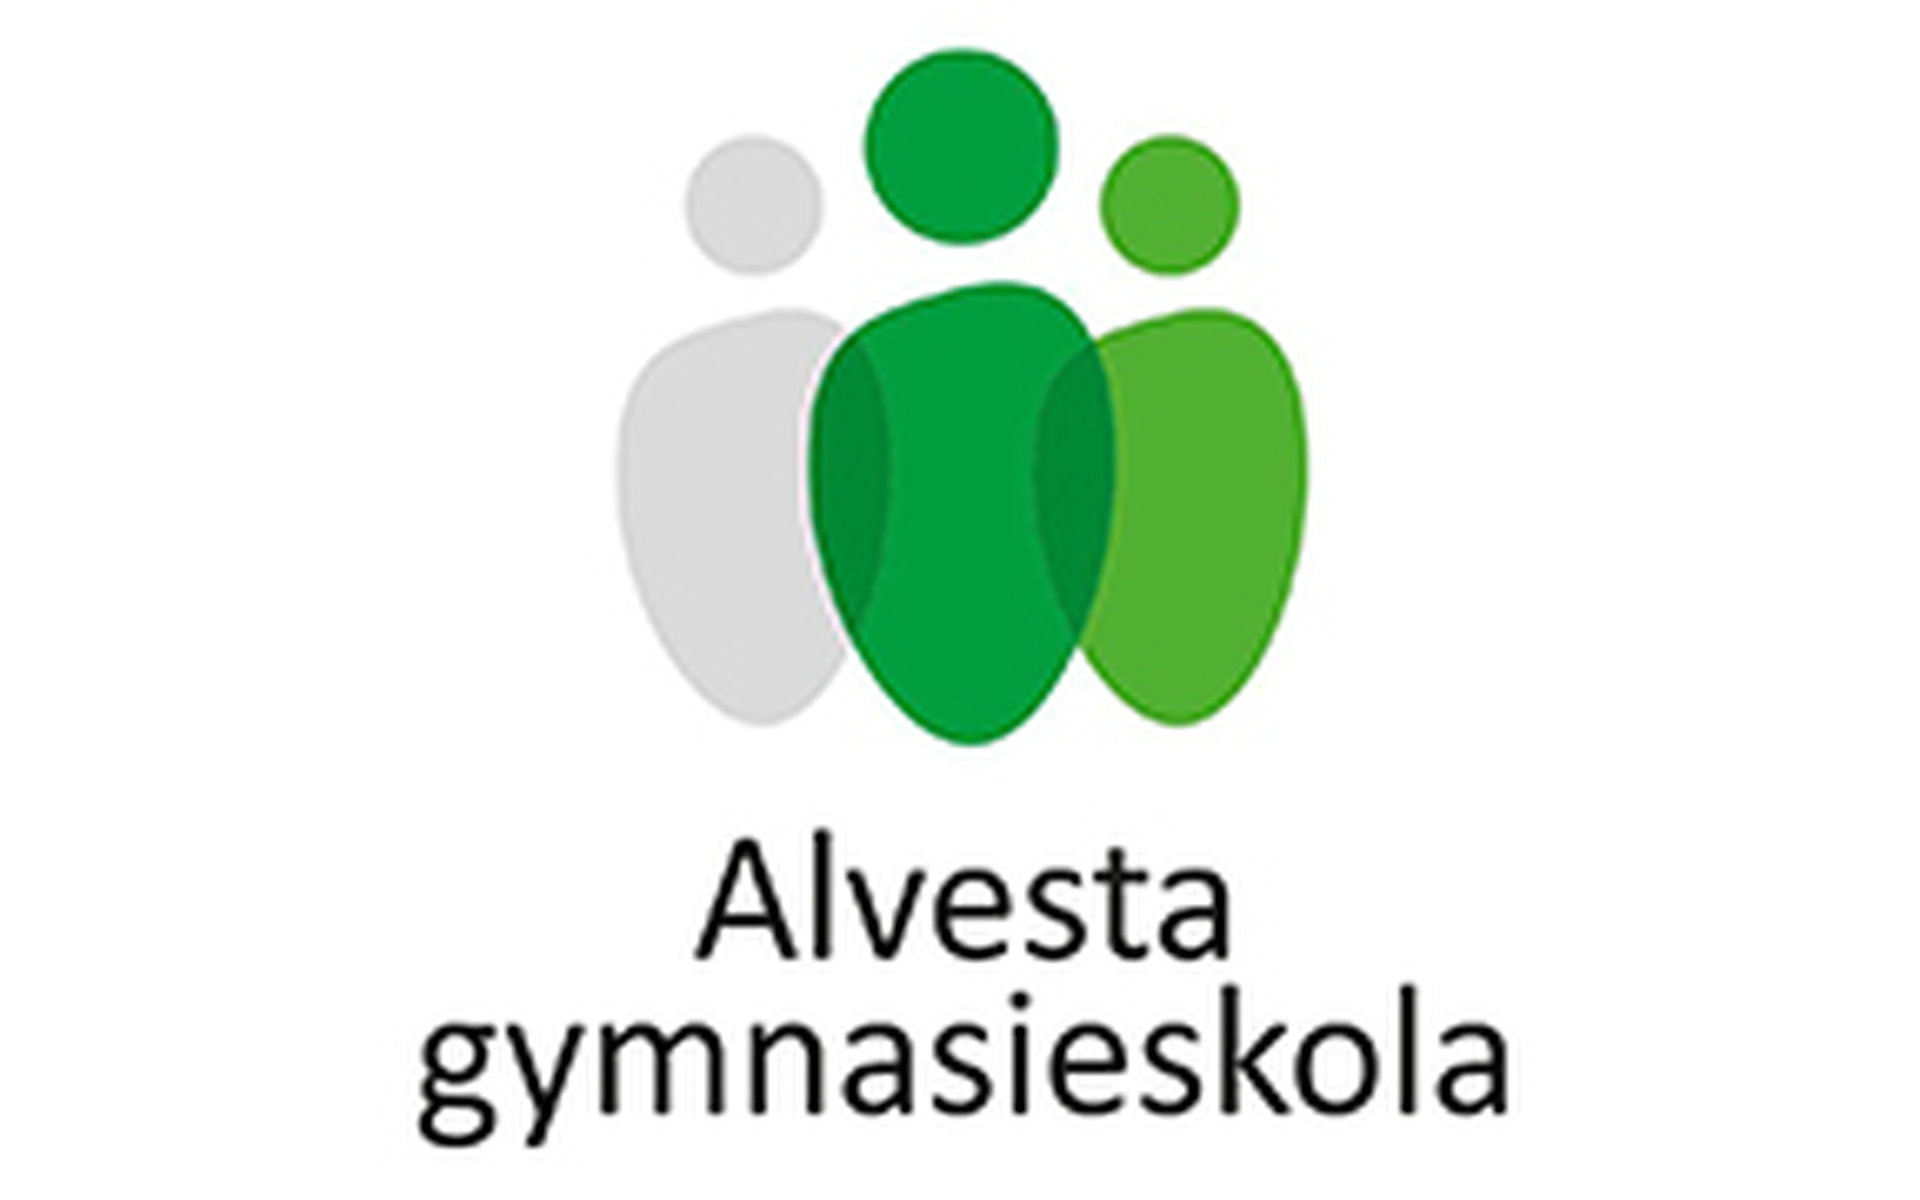 Alvesta Gymnasieskola